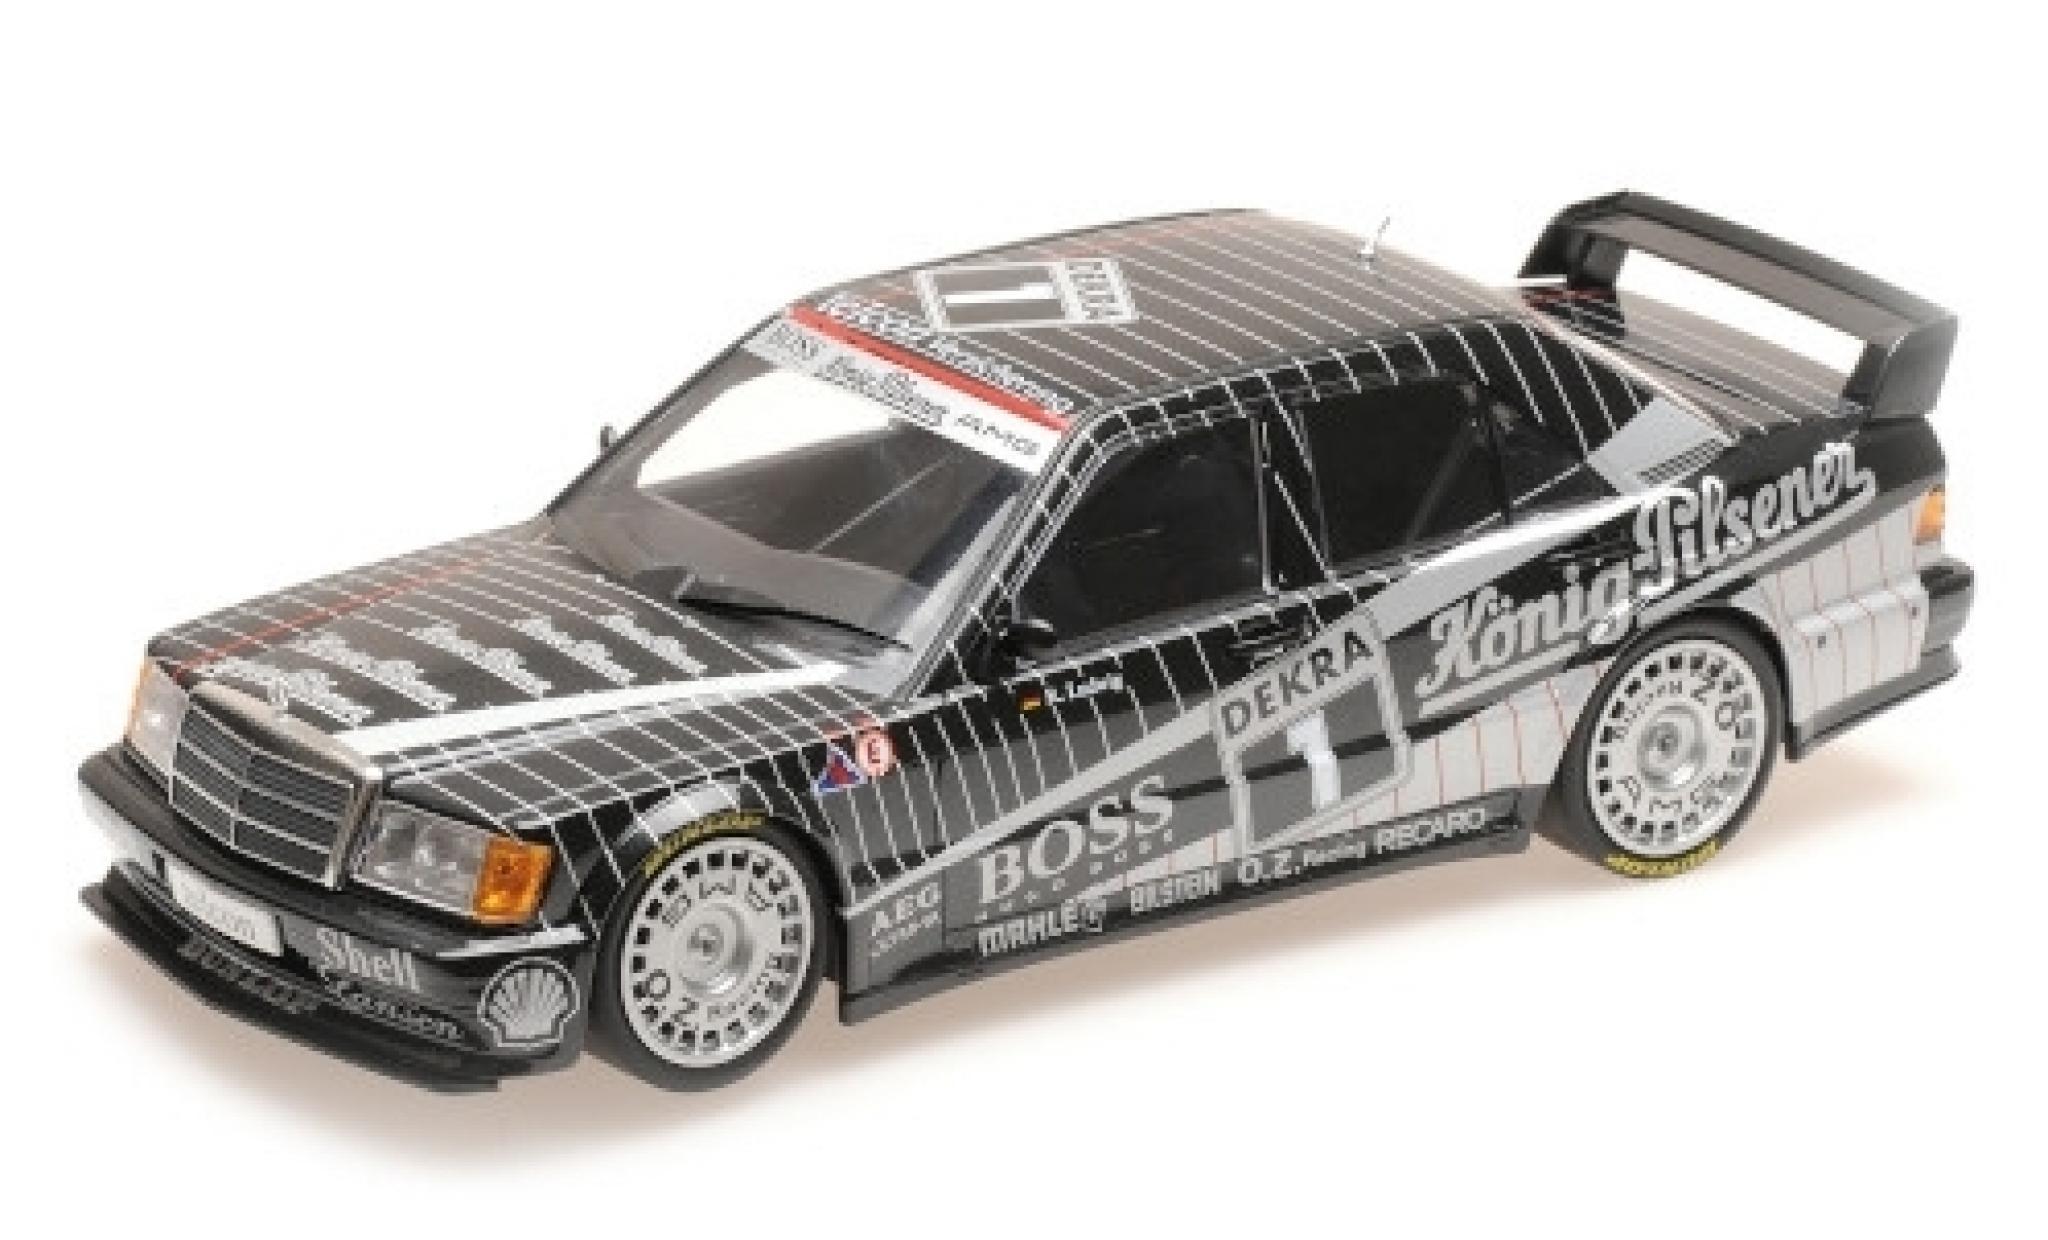 Mercedes 190 1/18 Minichamps E 2.5-16 Evo 1 No.1 AMG Boss / König-Pilsener DTM 1989 K.Ludwig